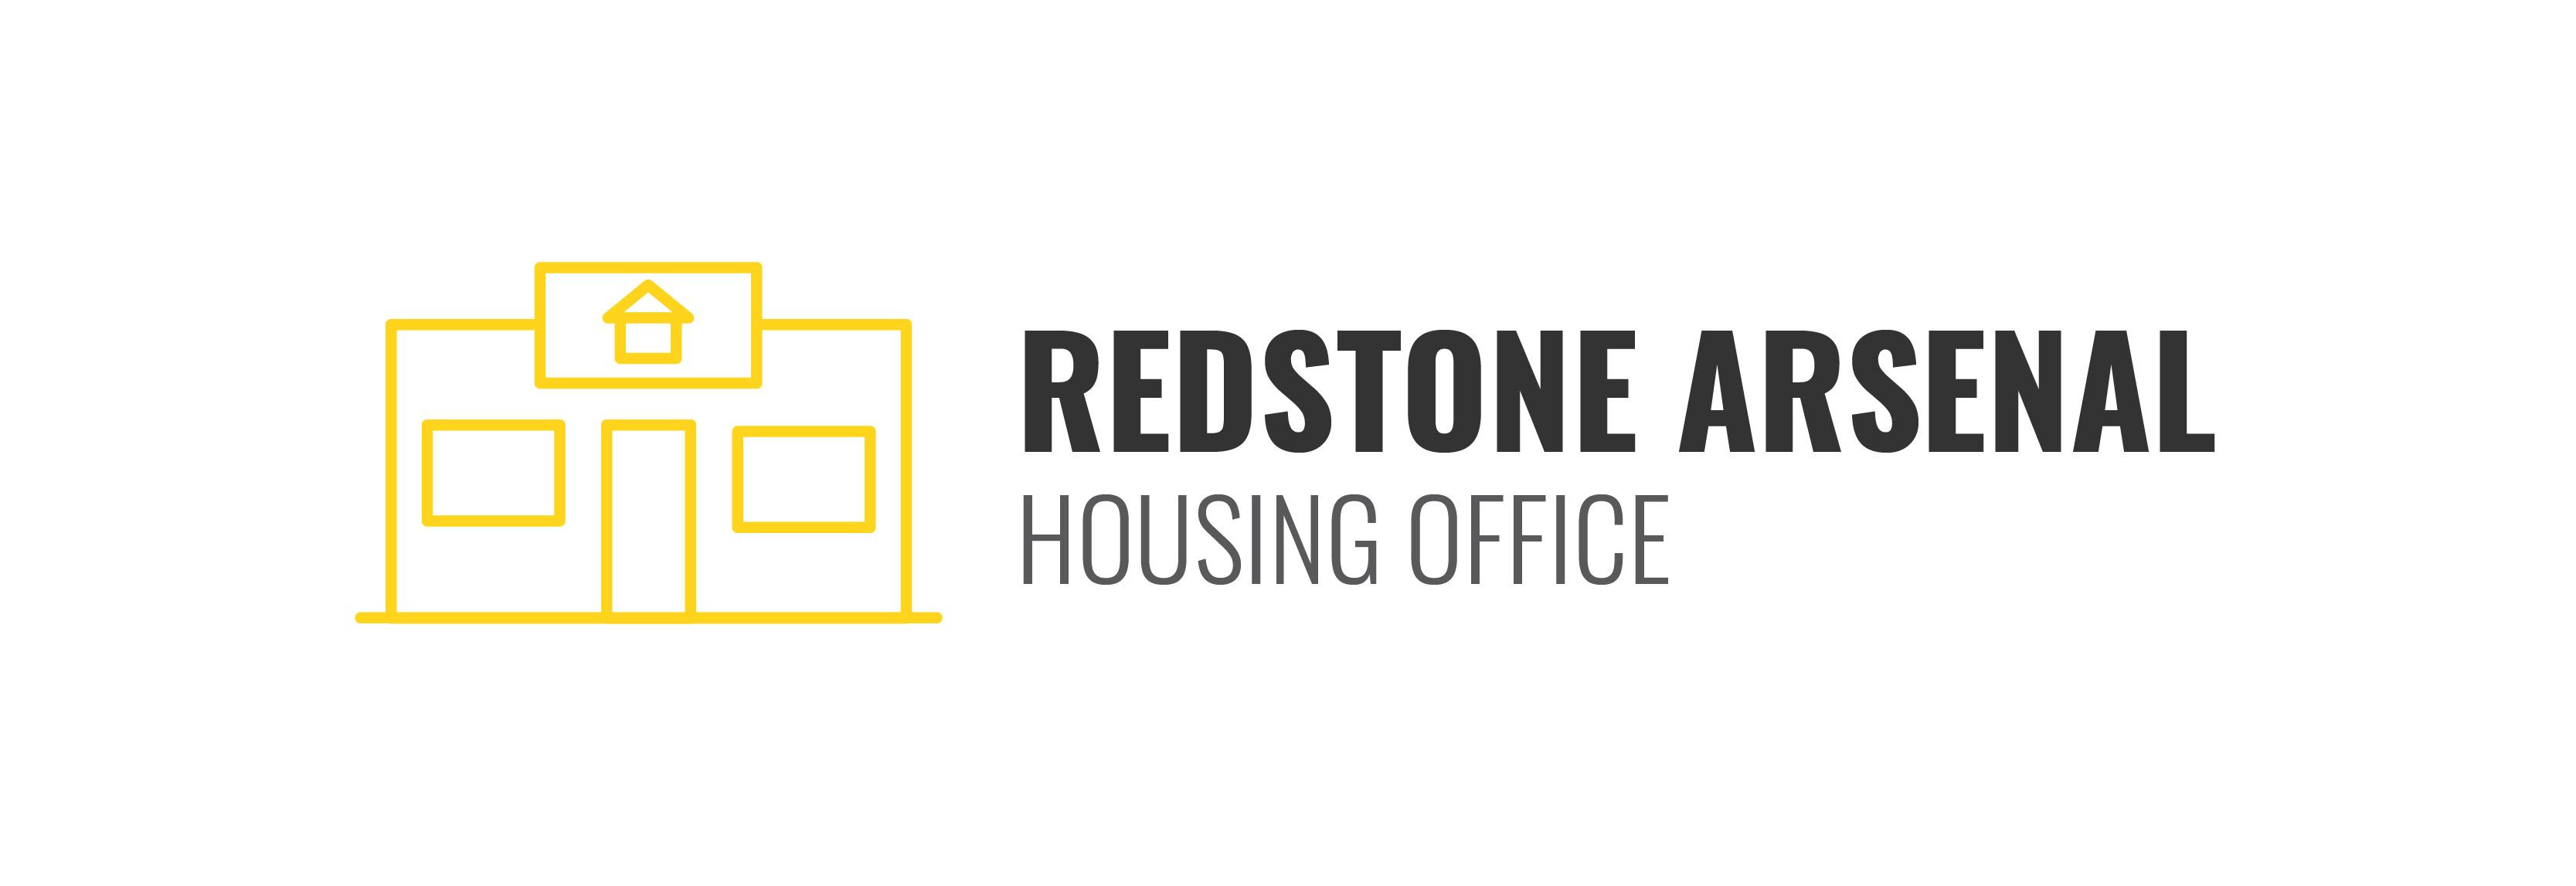 Redstone Arsenal Housing Office